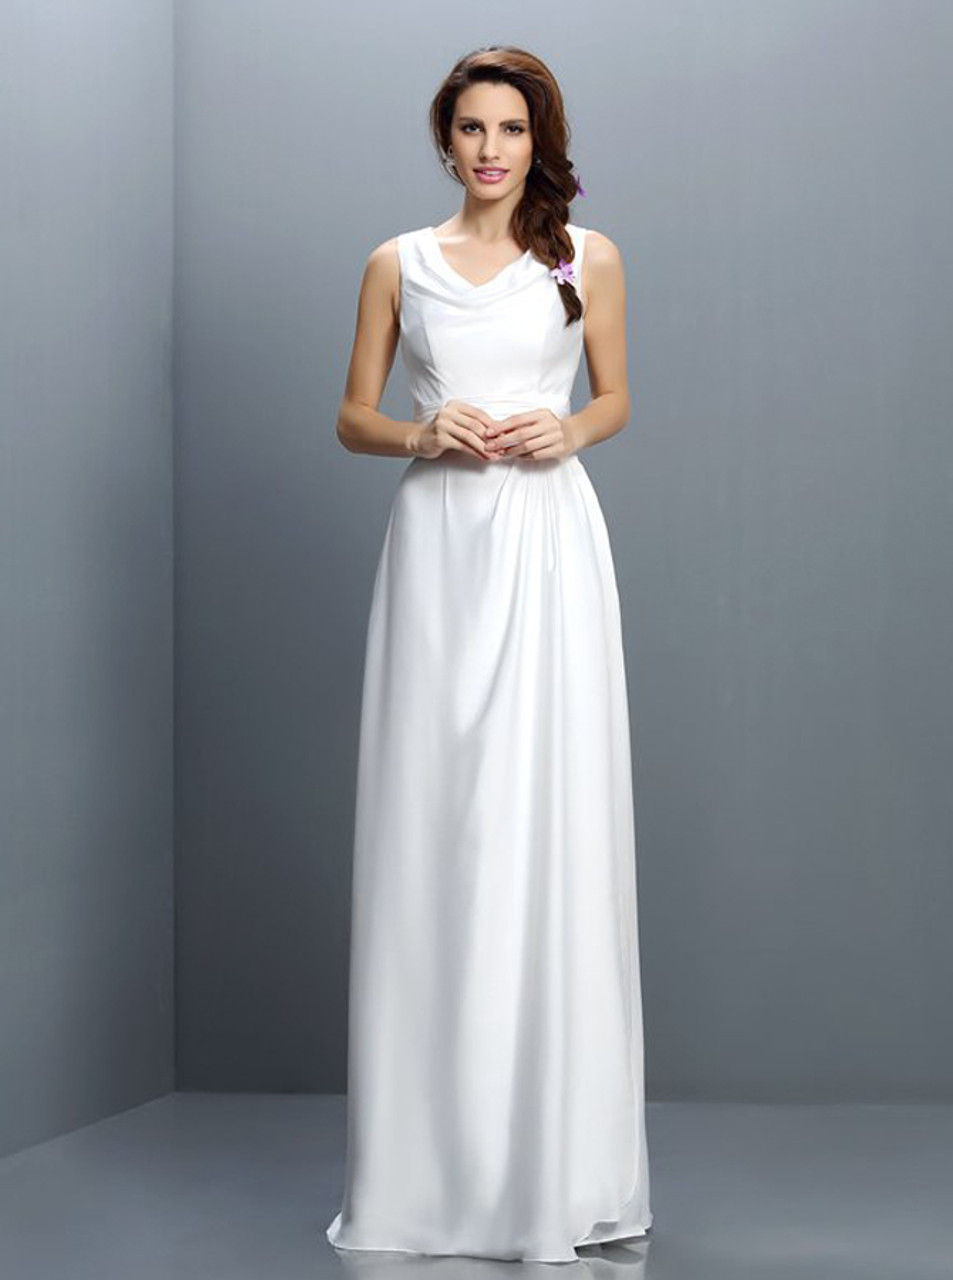 eab0657fe9587 White Cowl Neck Bridesmaid Dresses,Modest Bridesmaid Dress,11419 -  Landress.co.uk